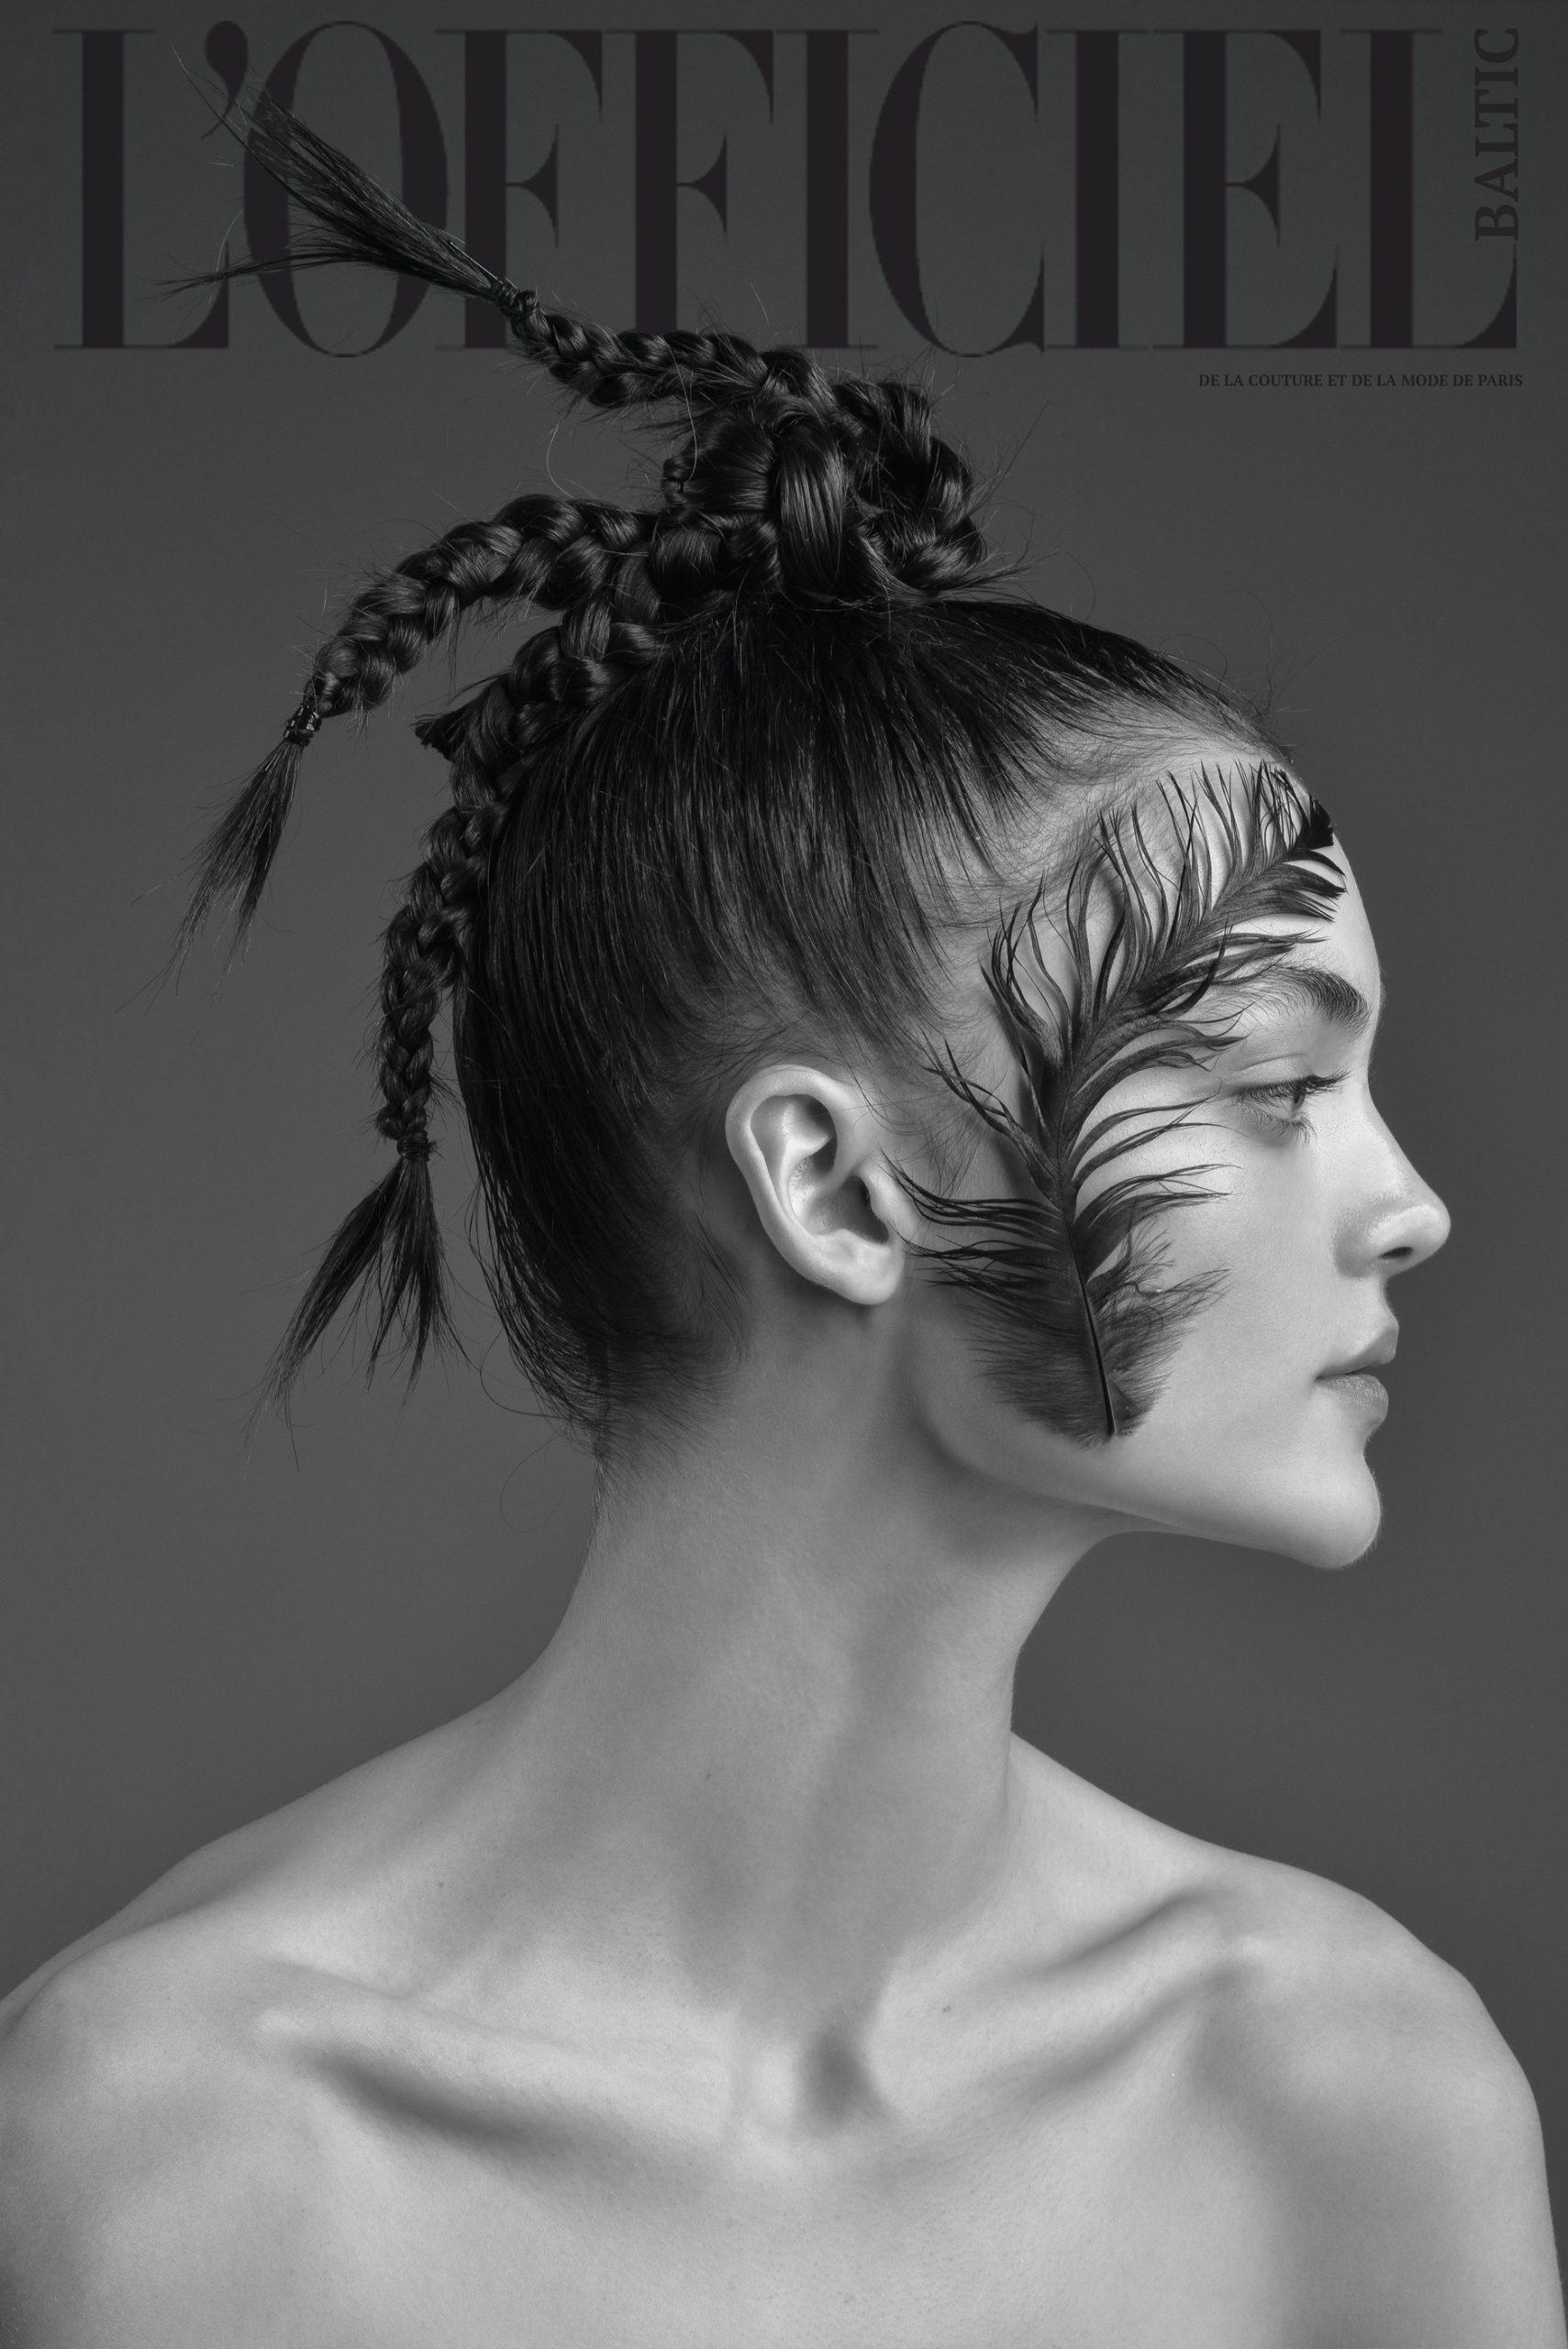 Lofficiel-Baltic-photographe-Mathieu-Puga-make-up-Virginie-Rascle-hair-Cyril-laforet-1